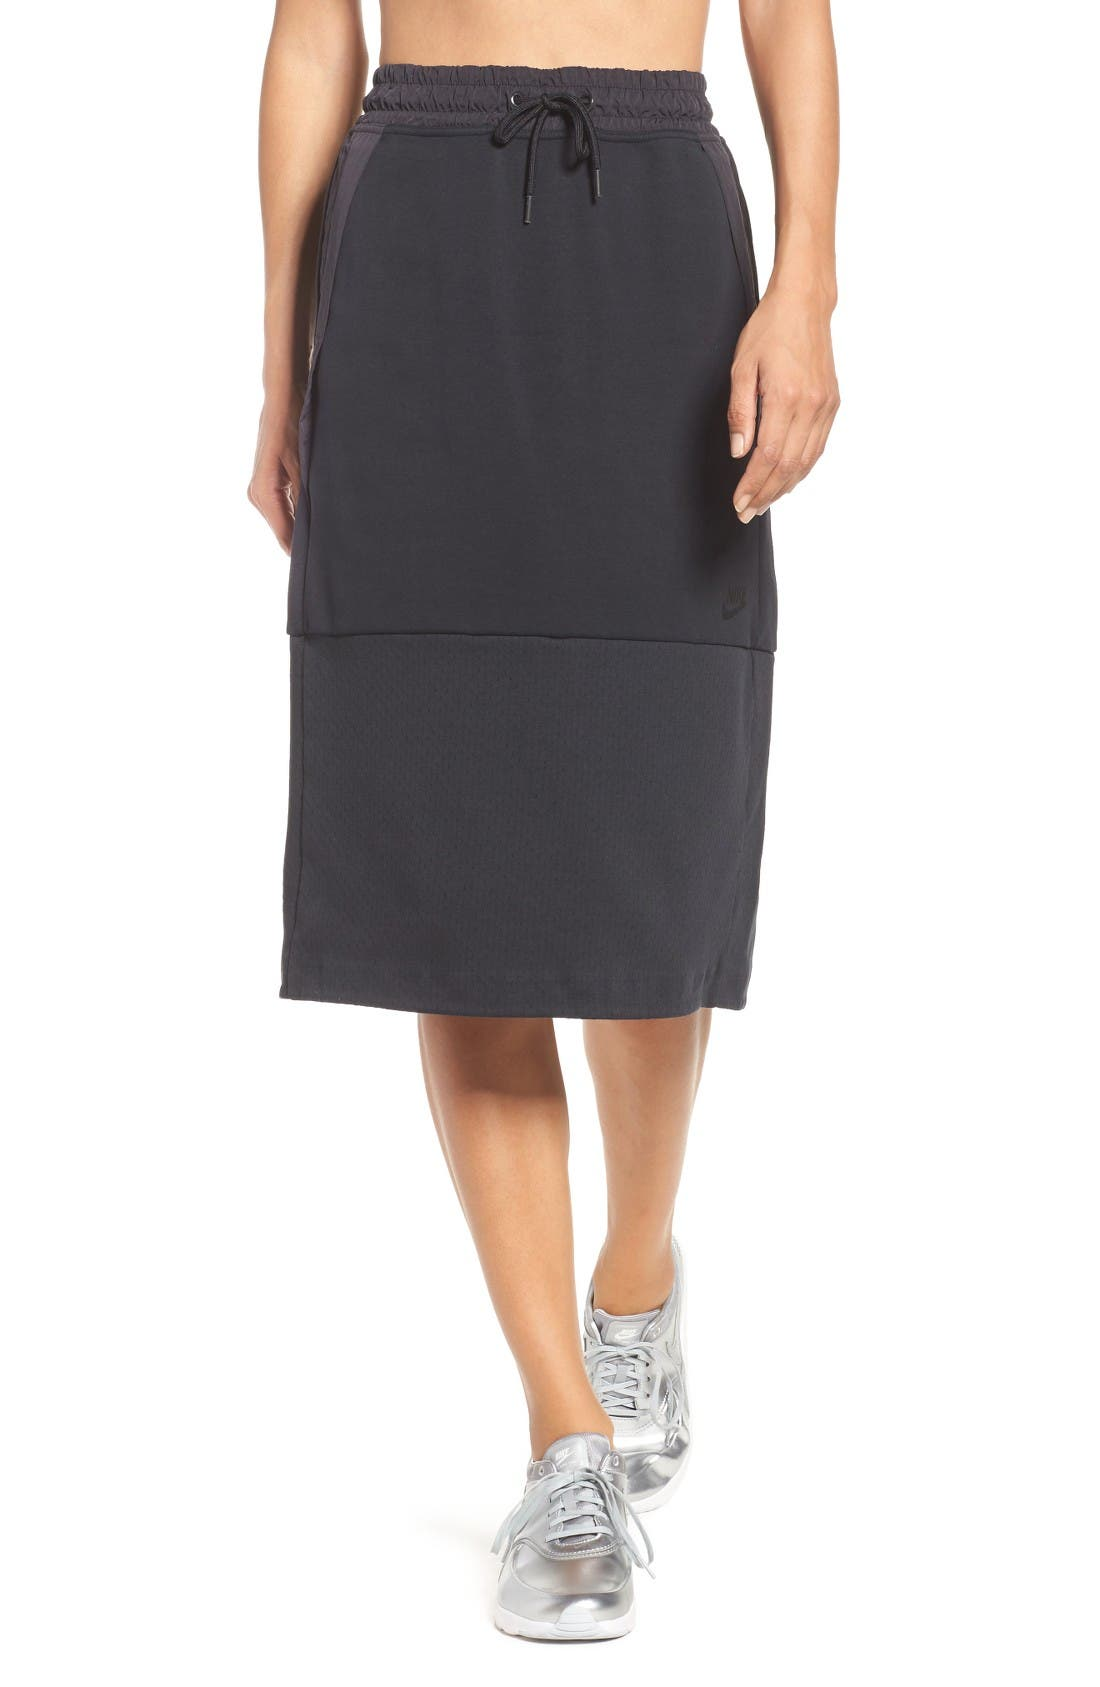 Main Image - Nike Tech Fleece Skirt